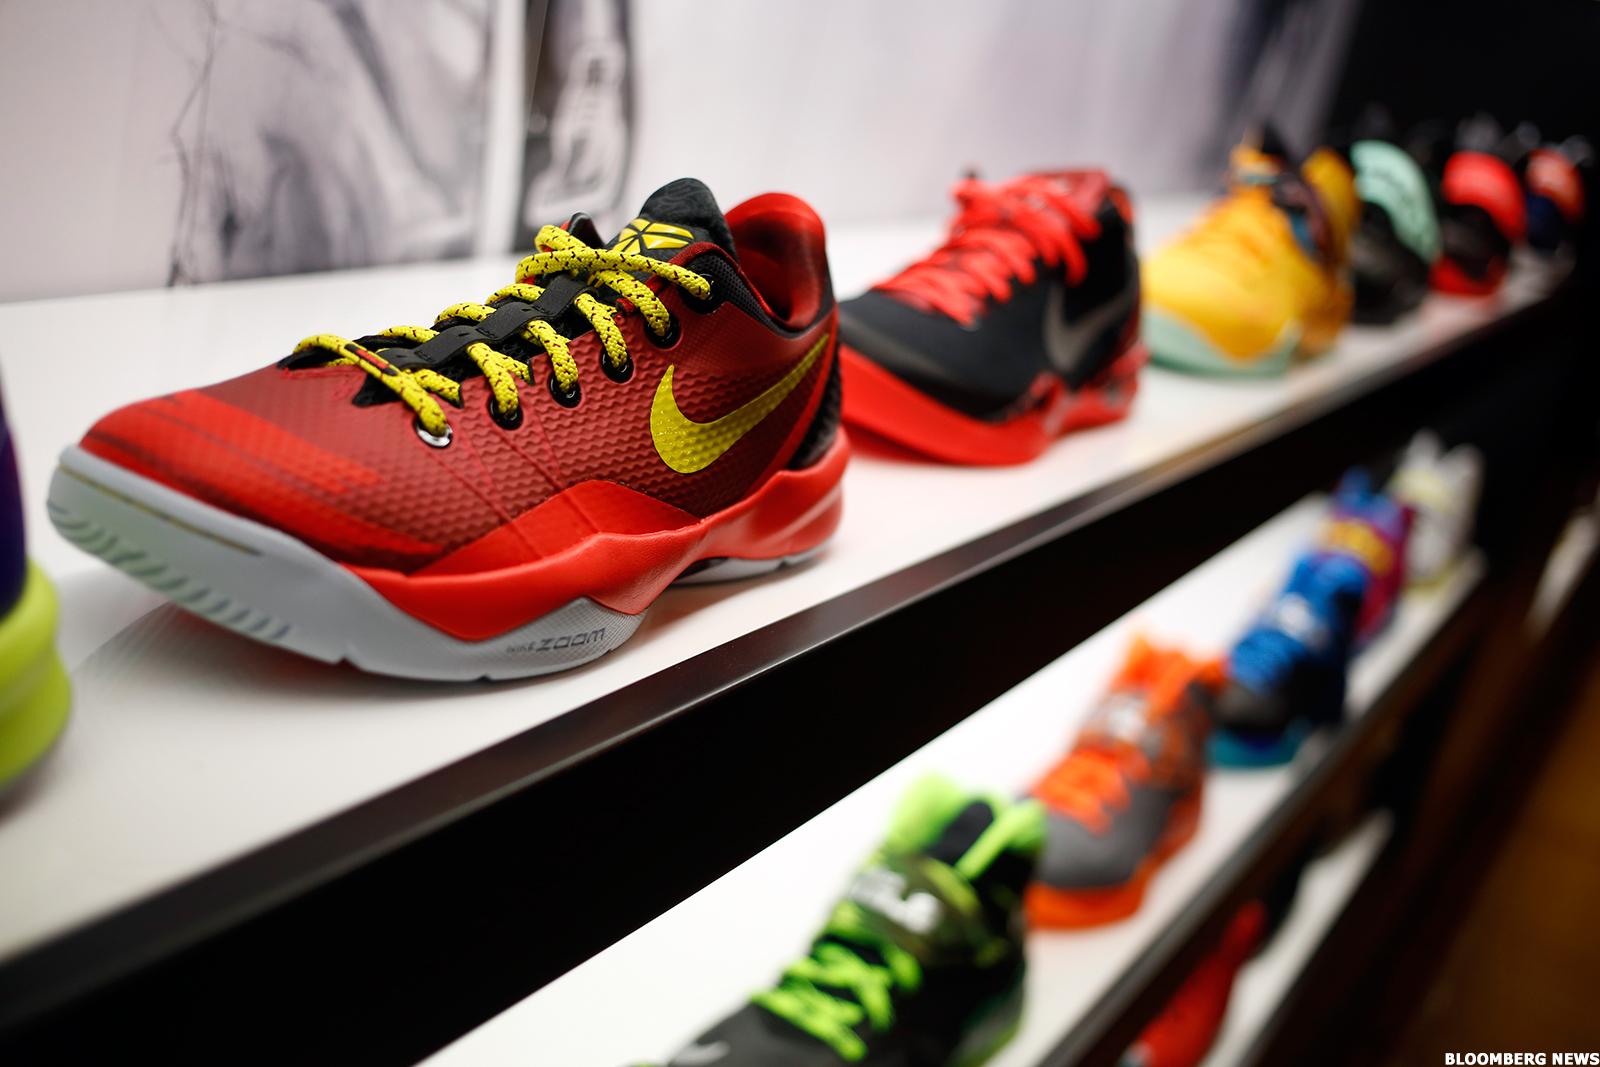 New Balance Challenges Nike Nke Adidas Addyy For